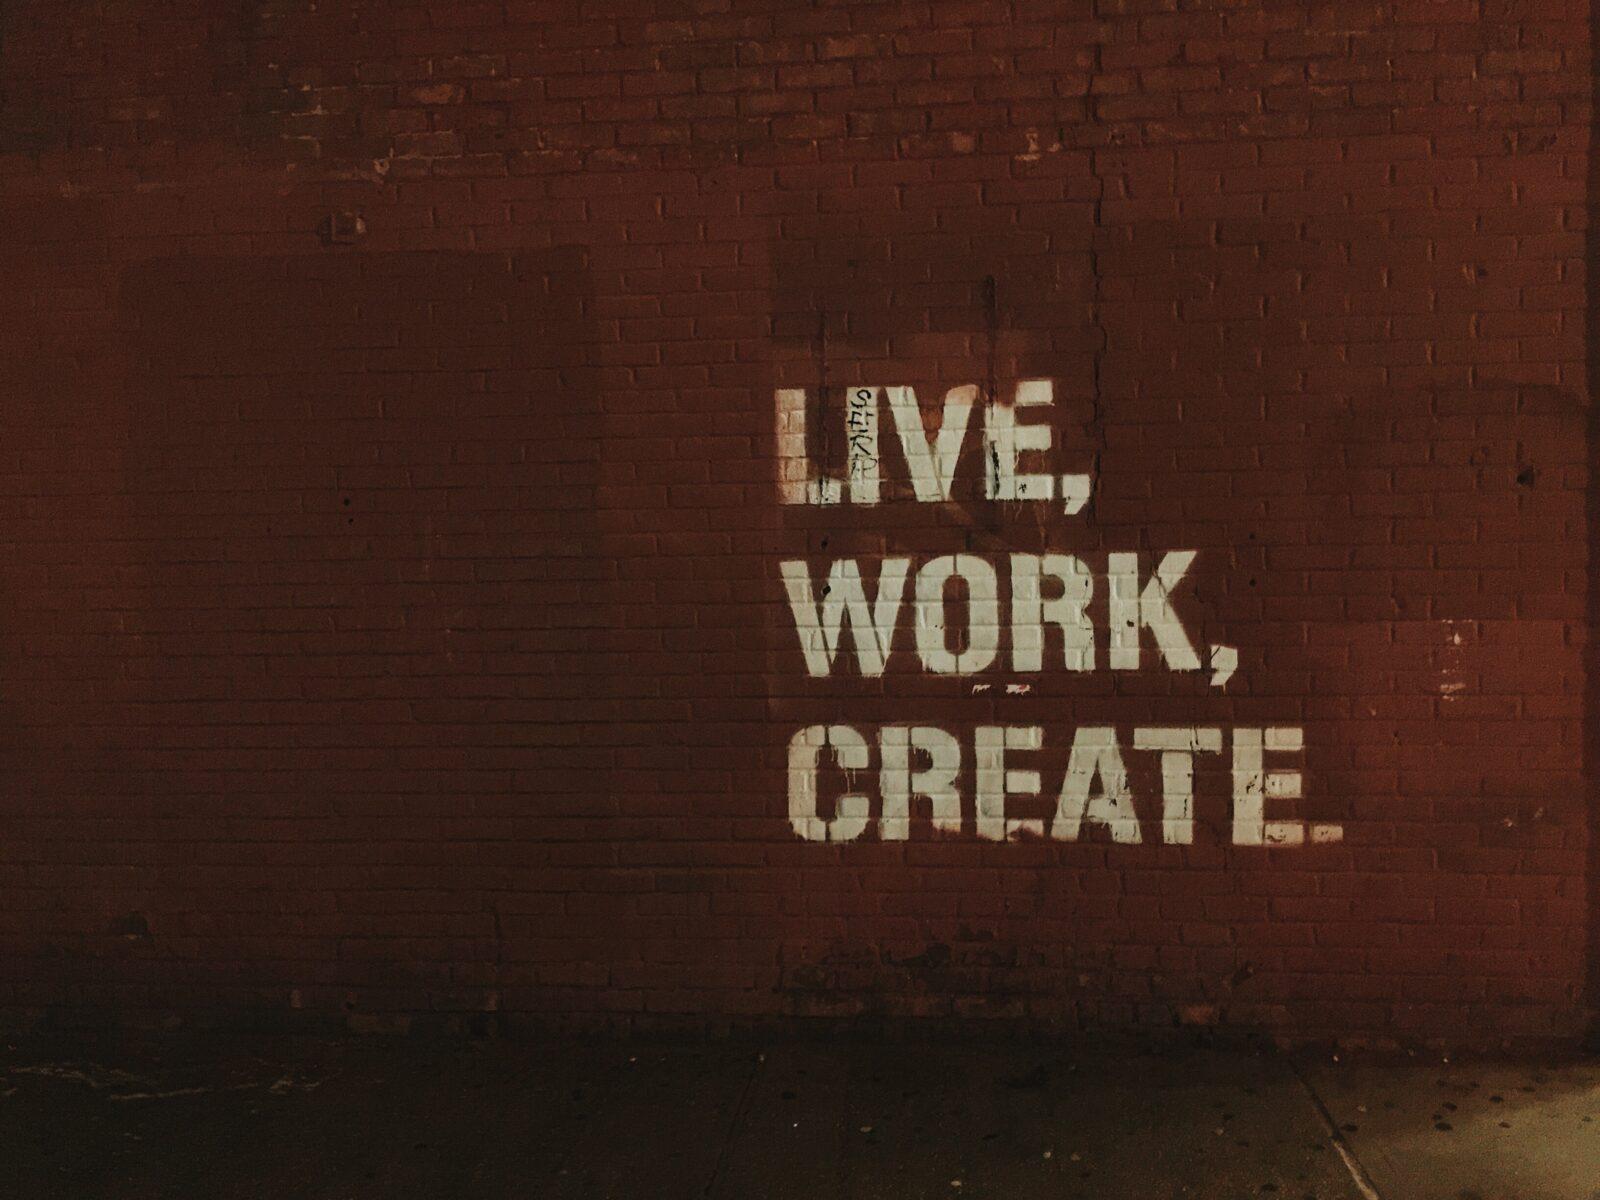 Live, Work, Create - Entrepreneurs